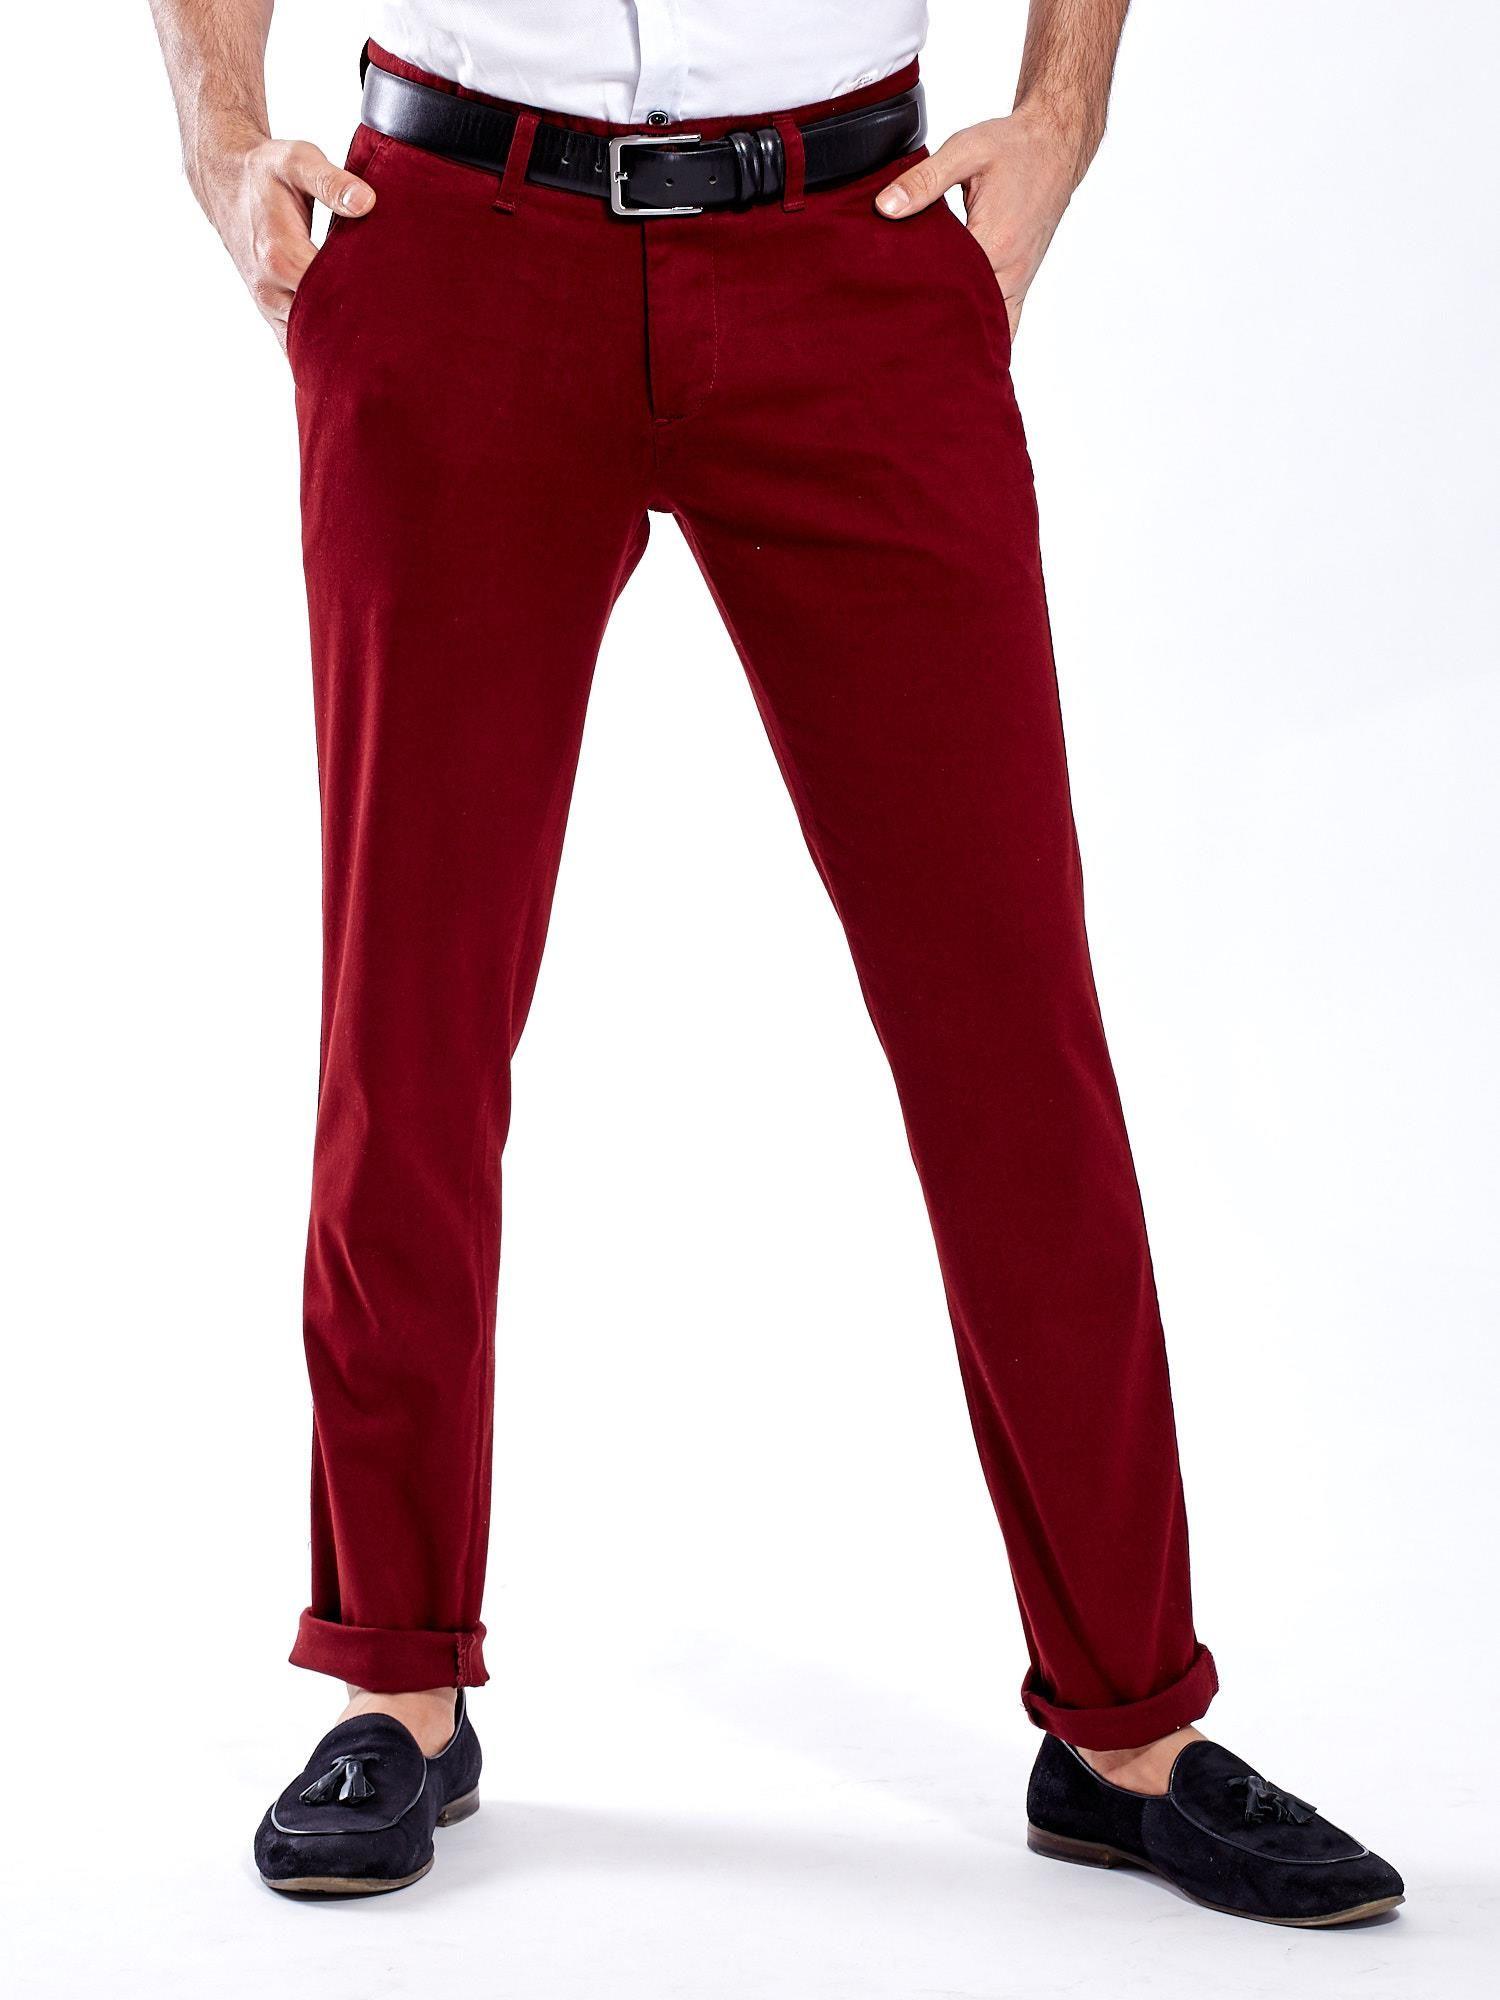 ee3c6a1d Bordowe spodnie męskie chinos - Mężczyźni Spodnie z materiału męskie ...